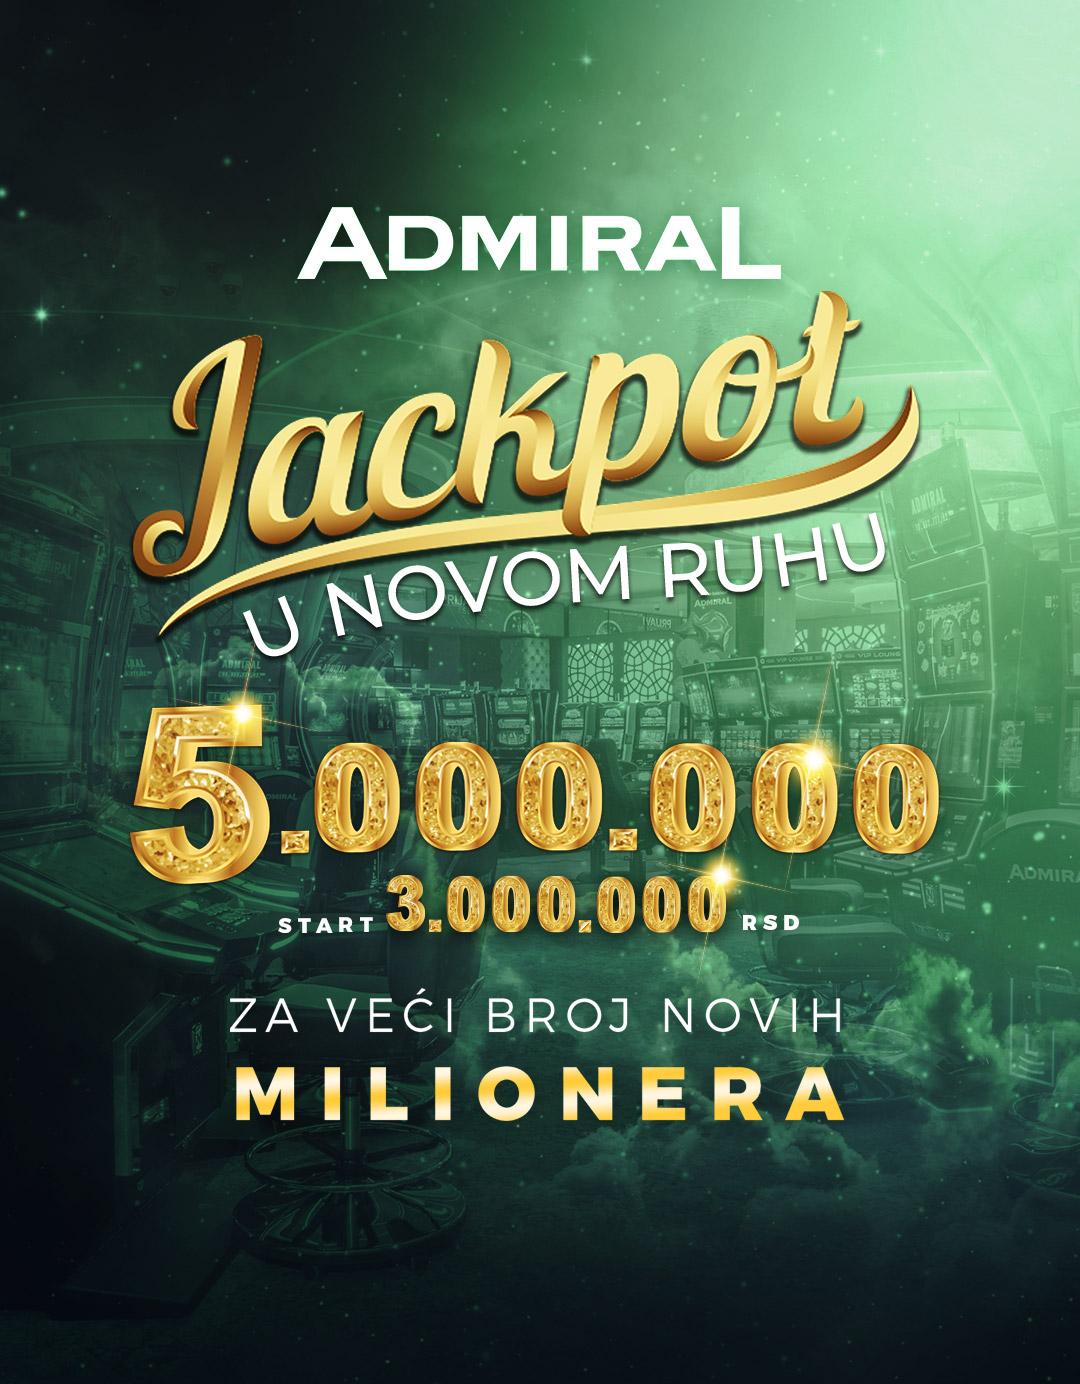 Globalni Admiral Jackpot SRB